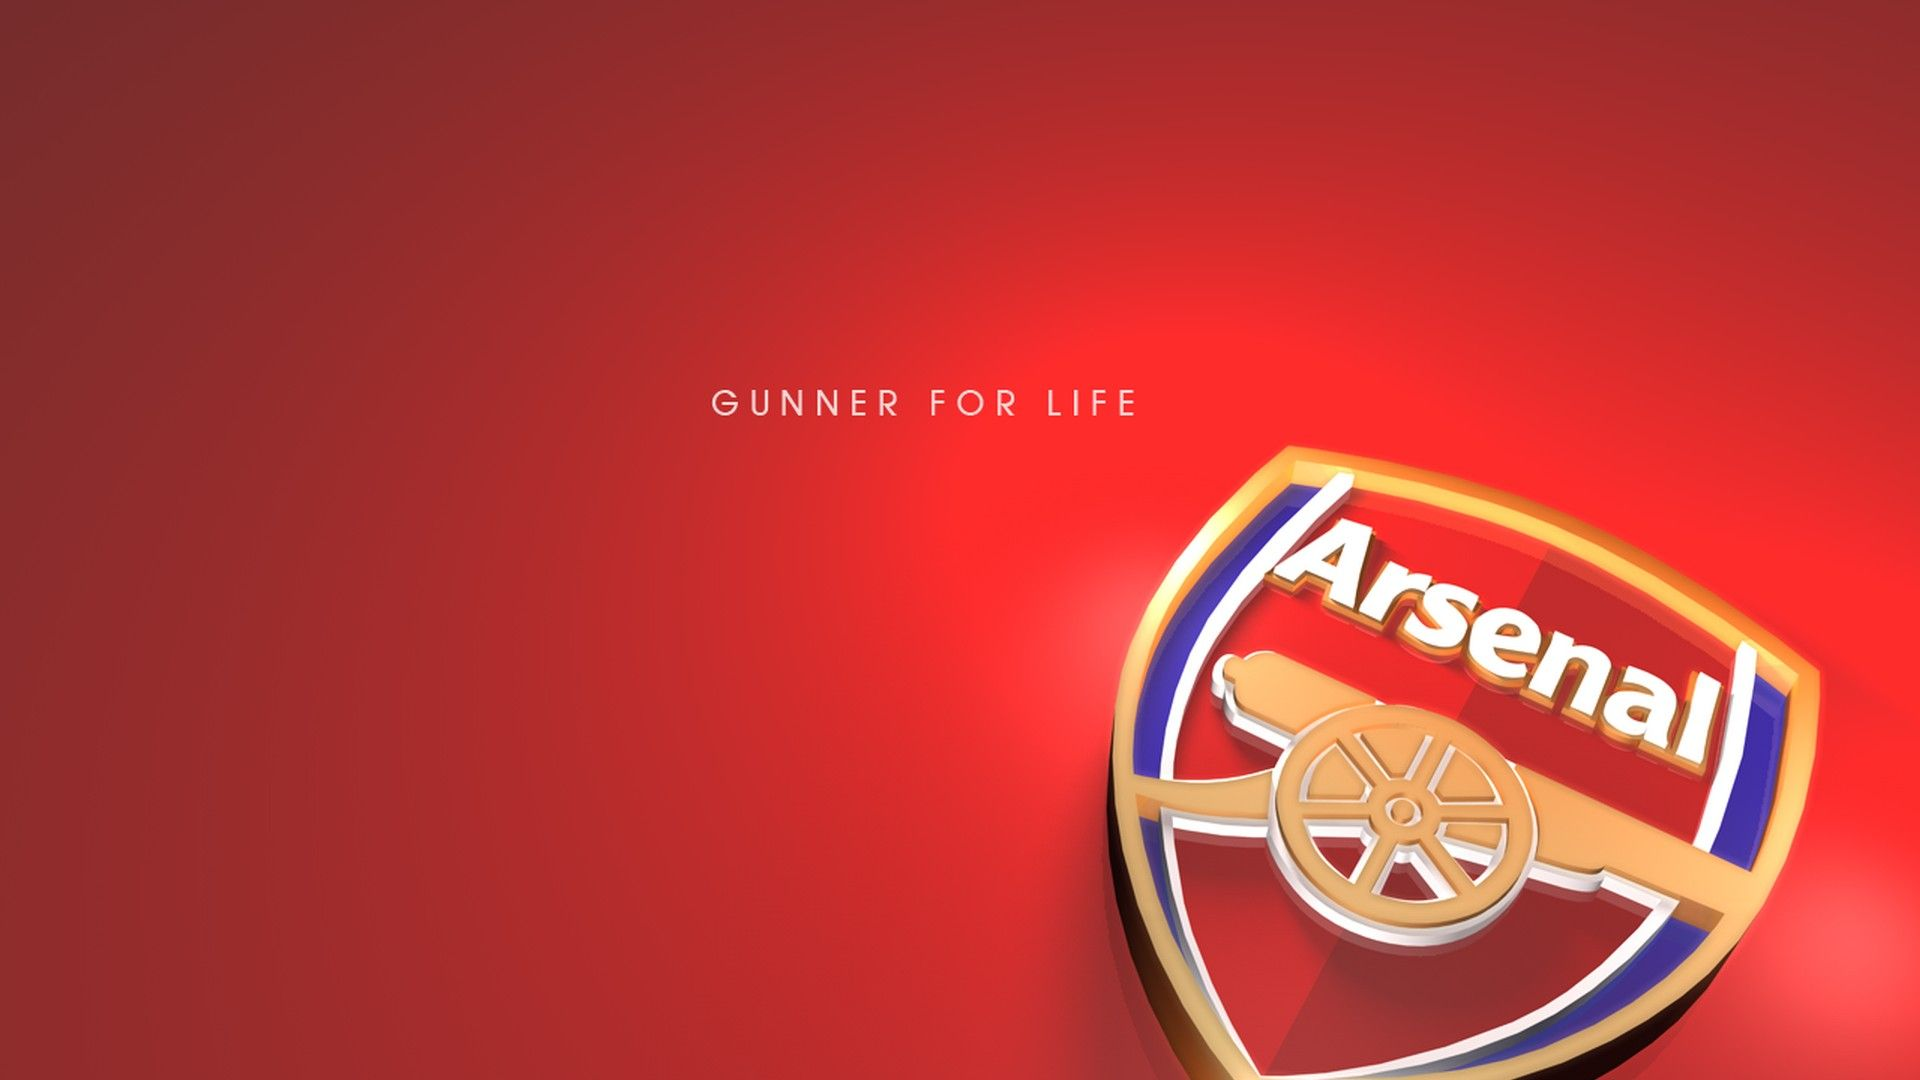 arsenal wallpaper for mac best